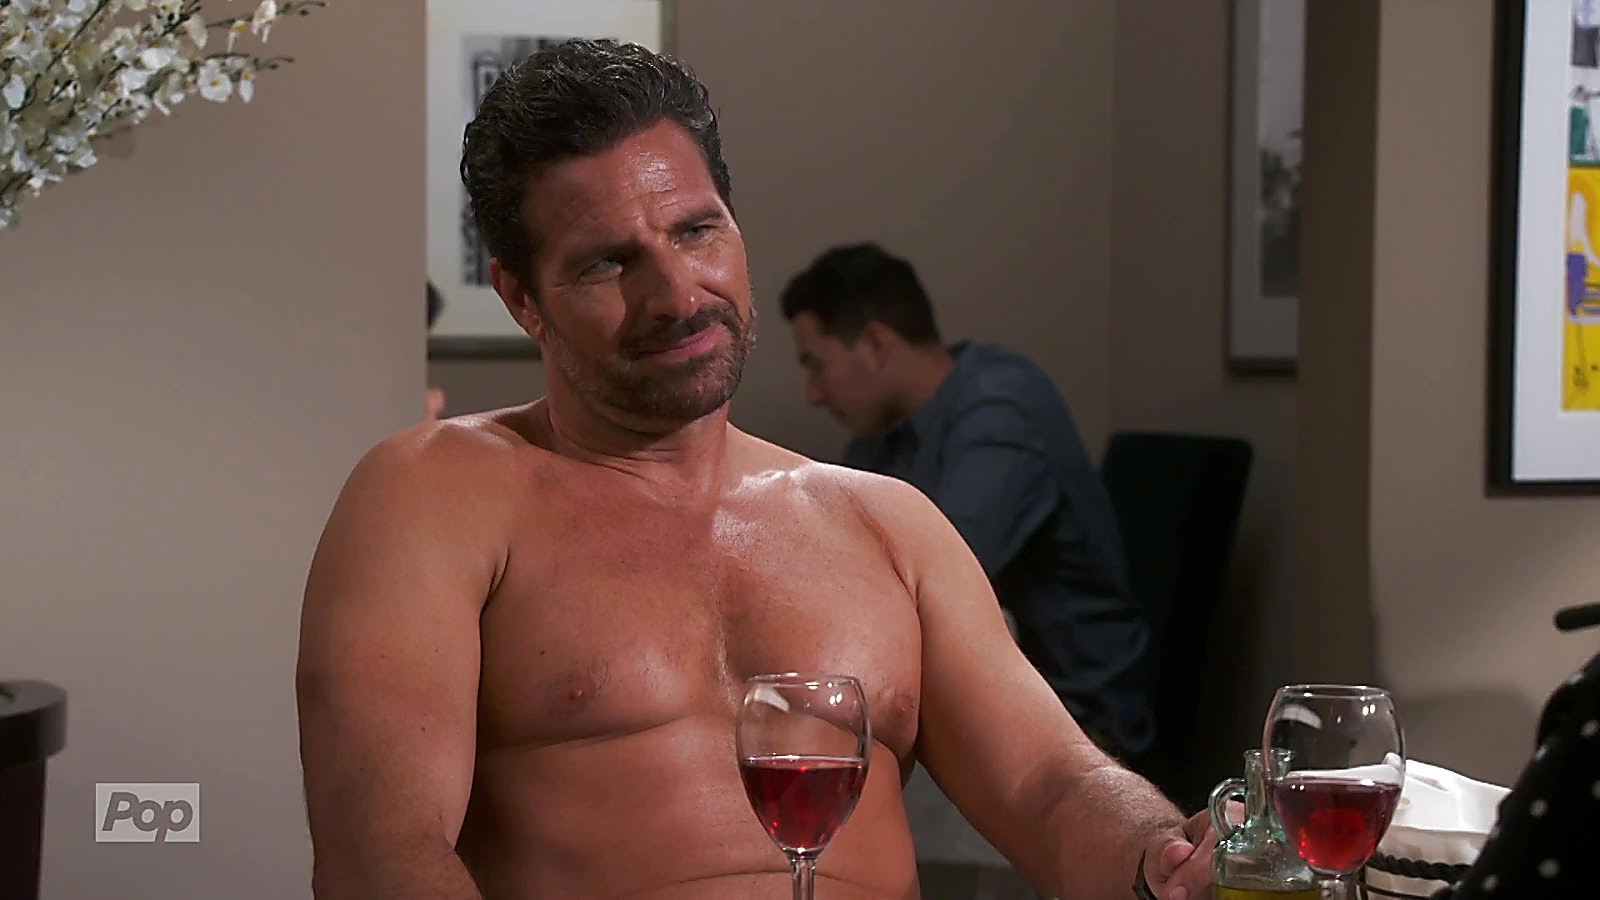 Ed Quinn sexy shirtless scene April 17, 2020, 8am